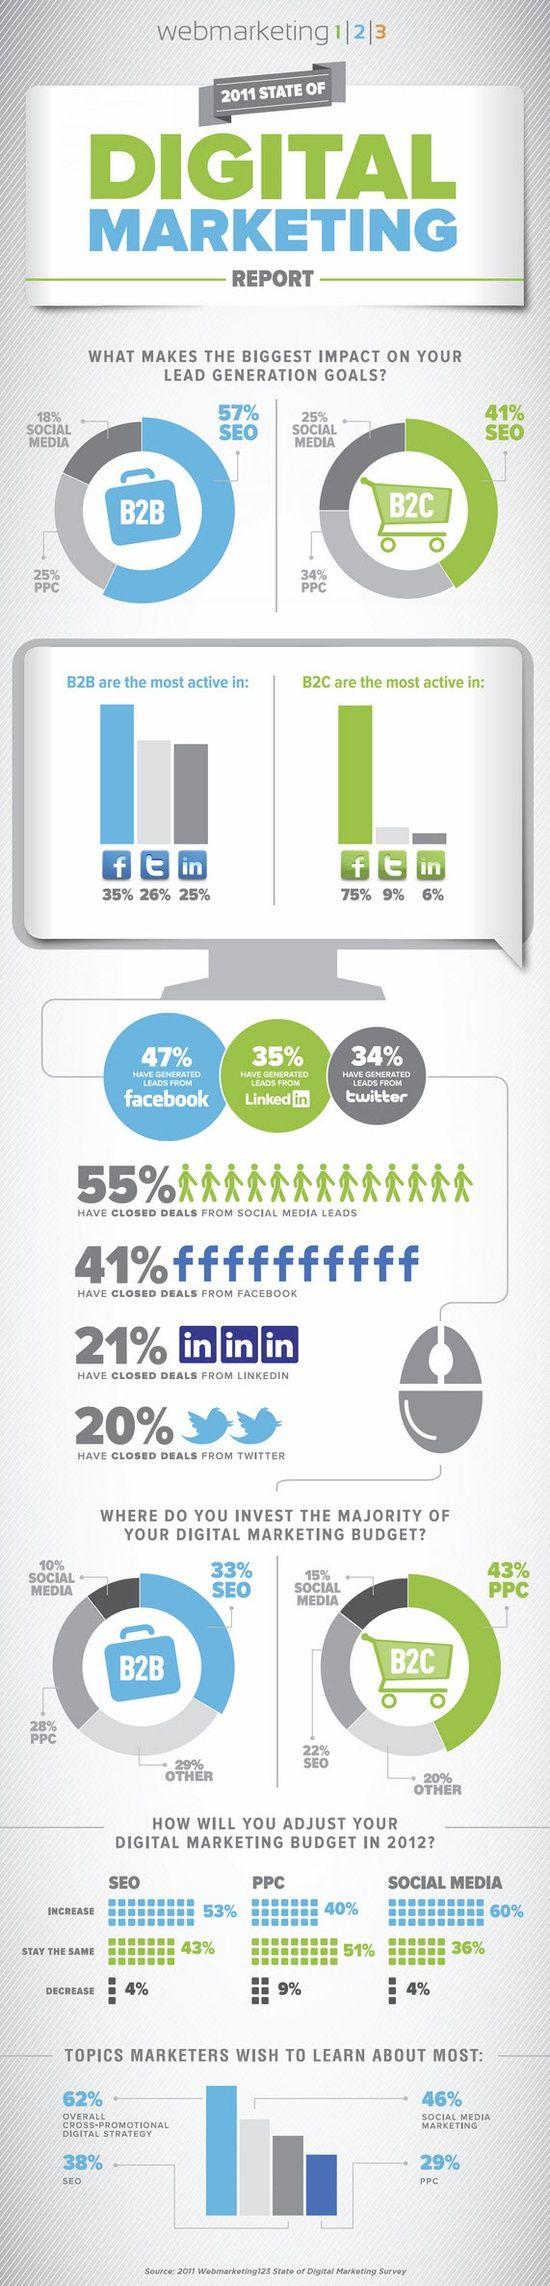 Social Media Marketing http://www.massinertia.com/